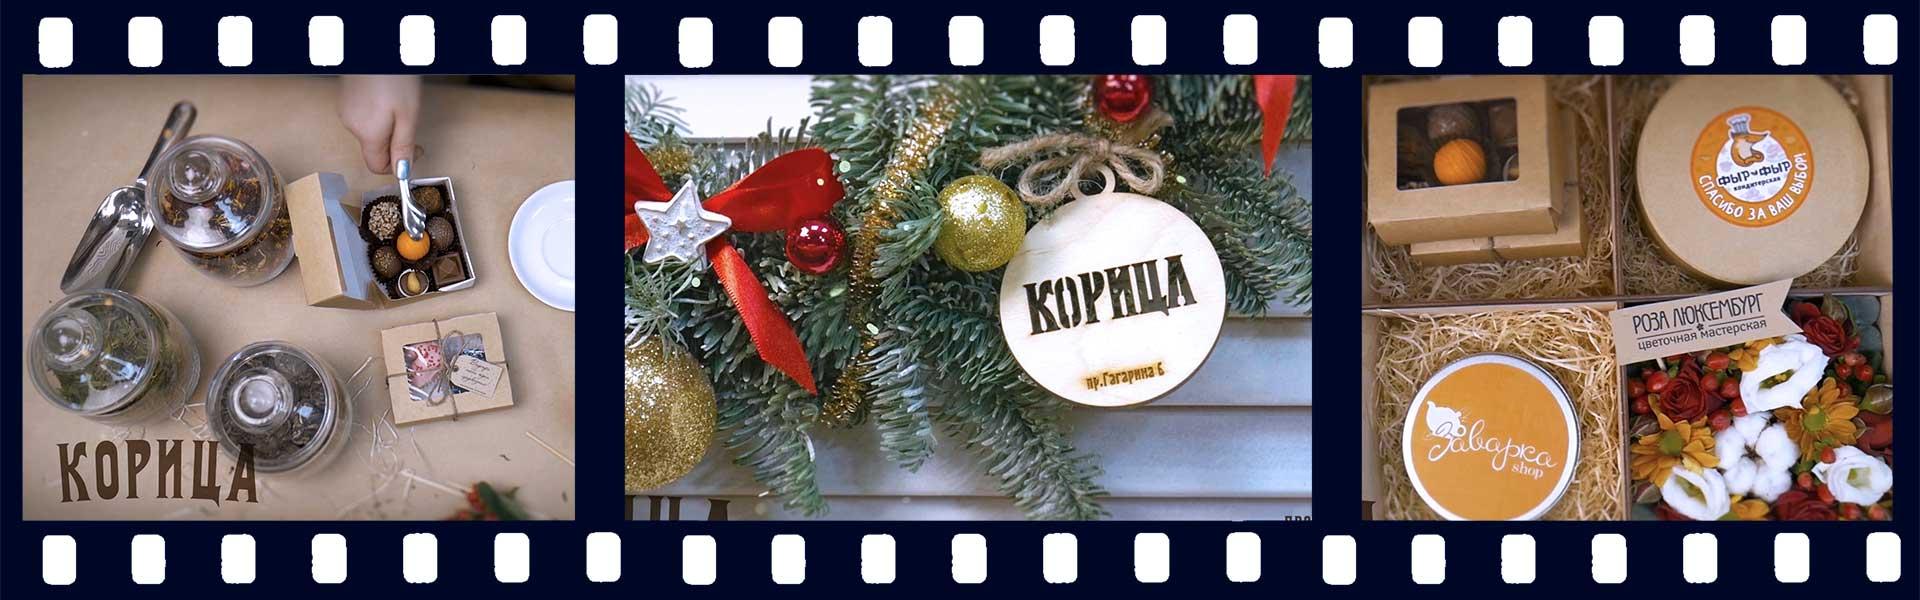 Телереклама магазина вкусных подарков «Корица»